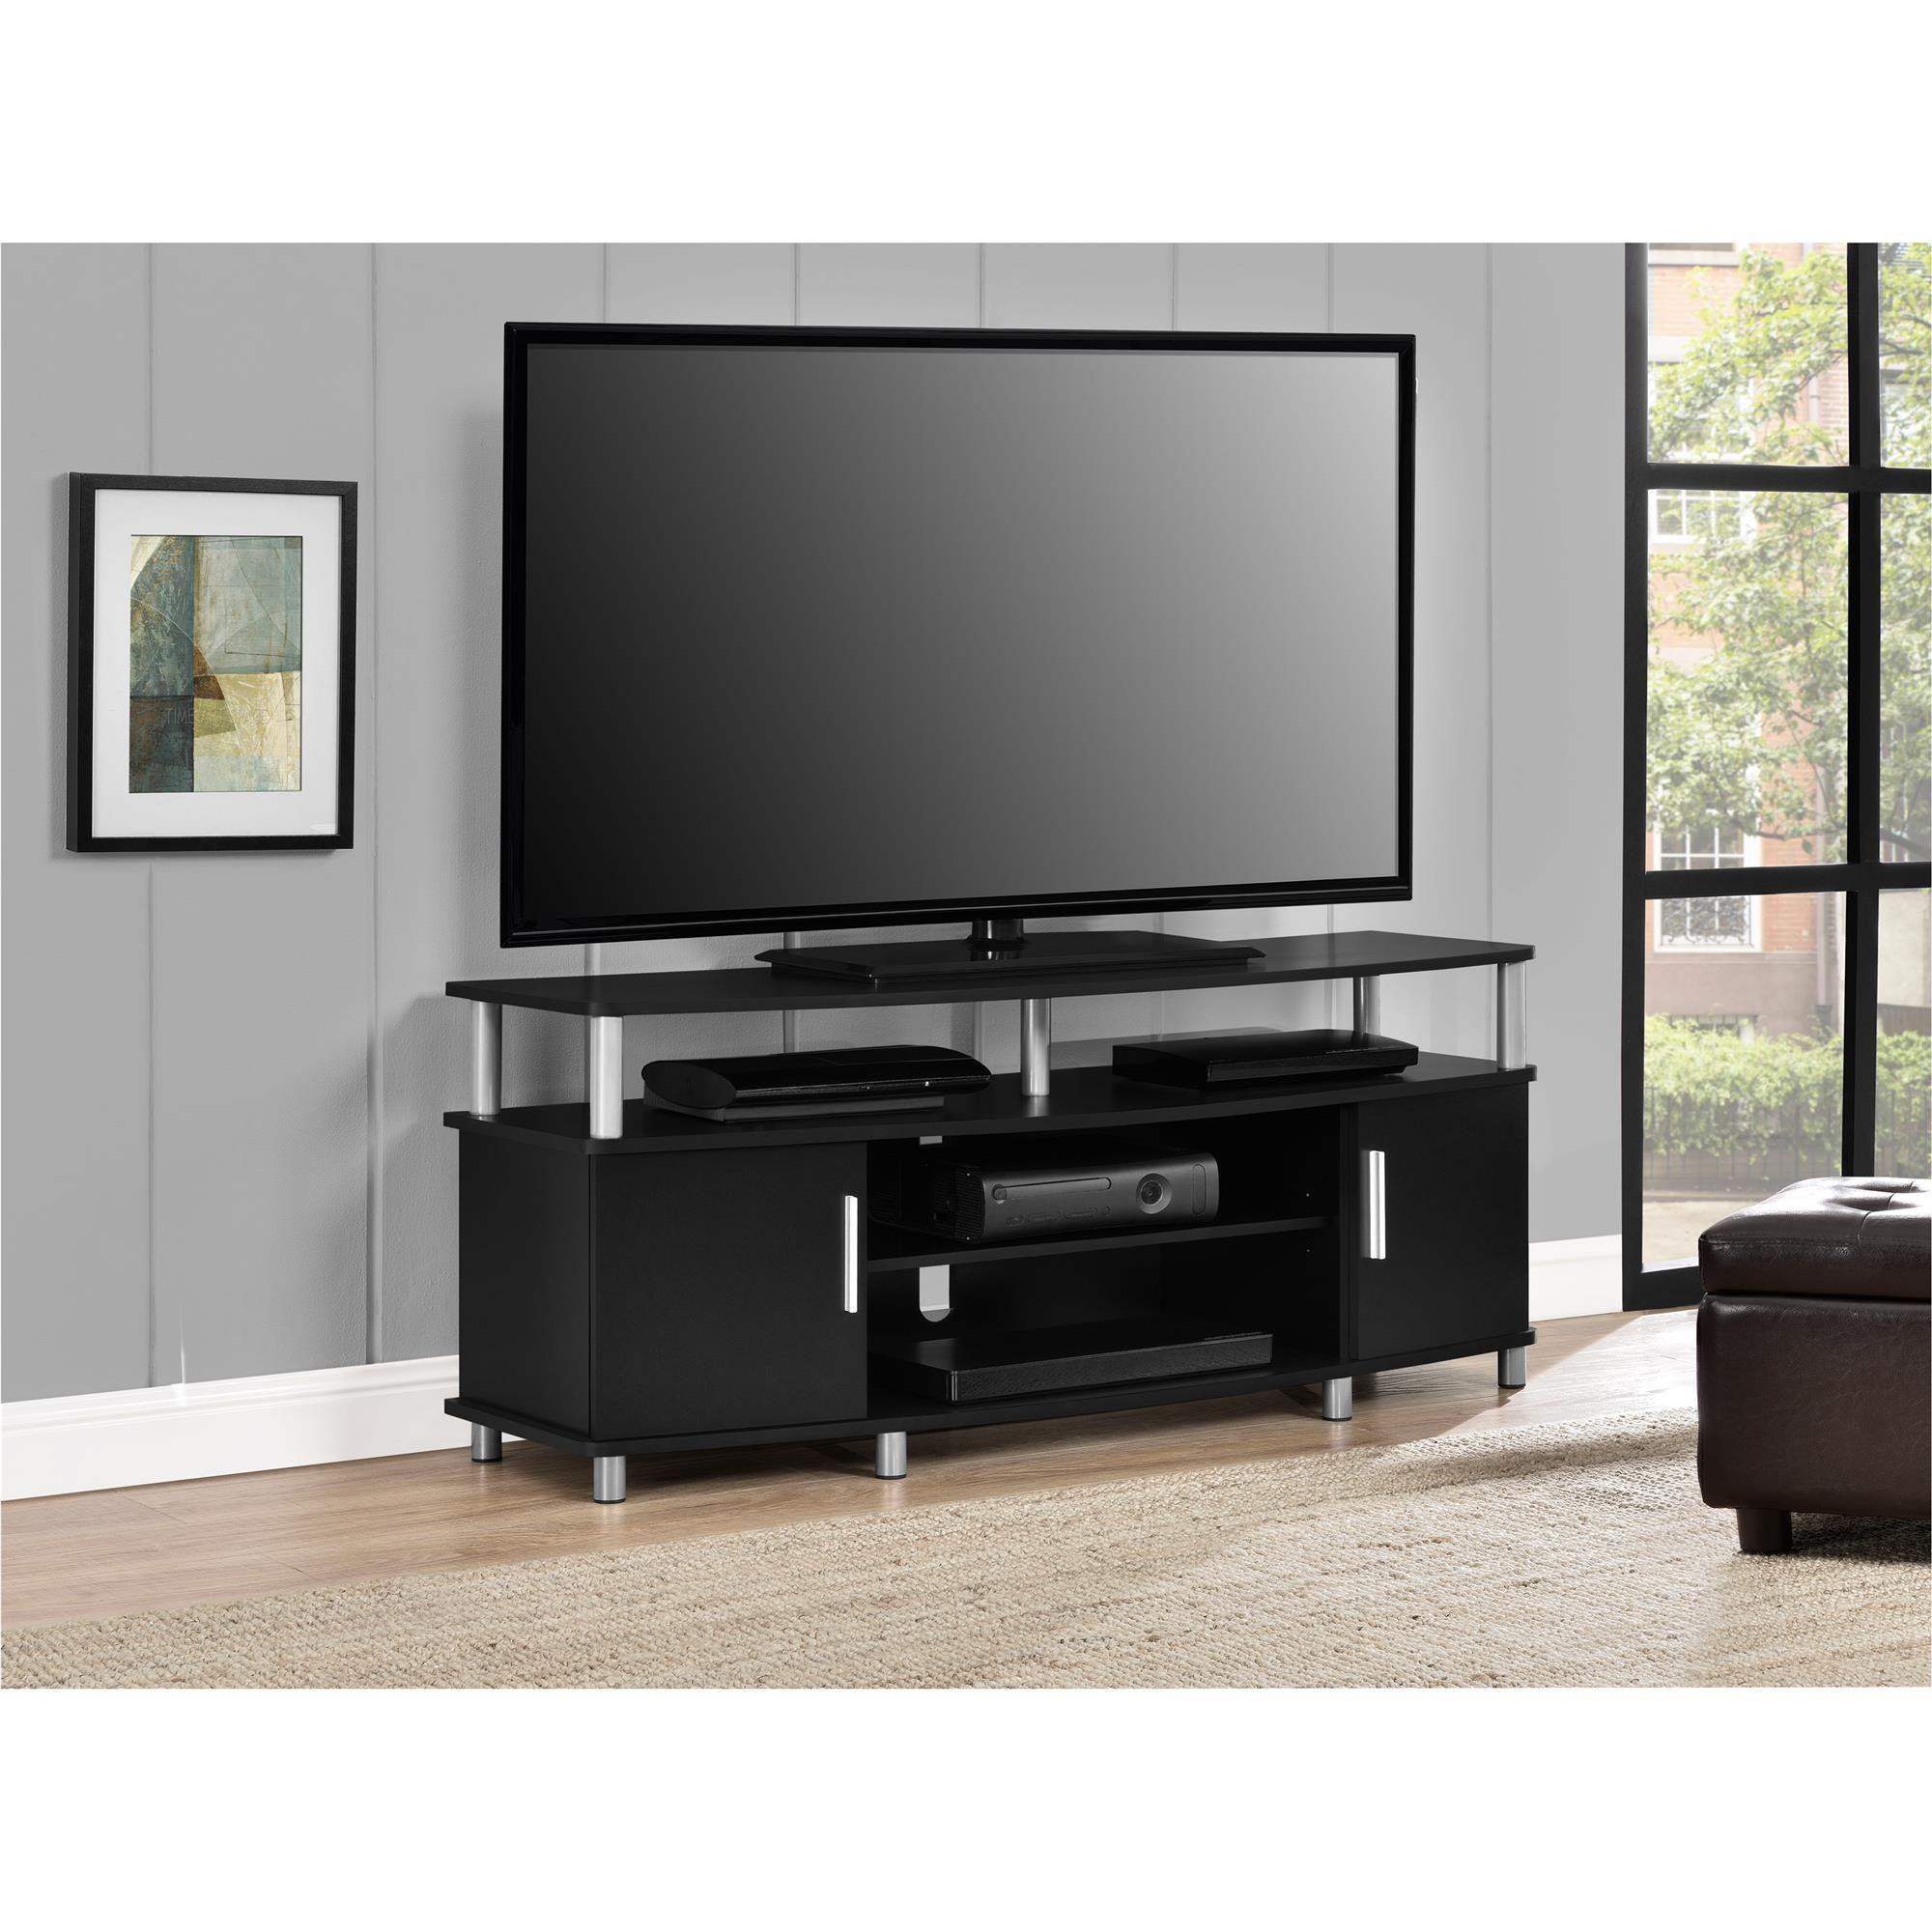 Altra Furniture Carson 50 in TV Stand